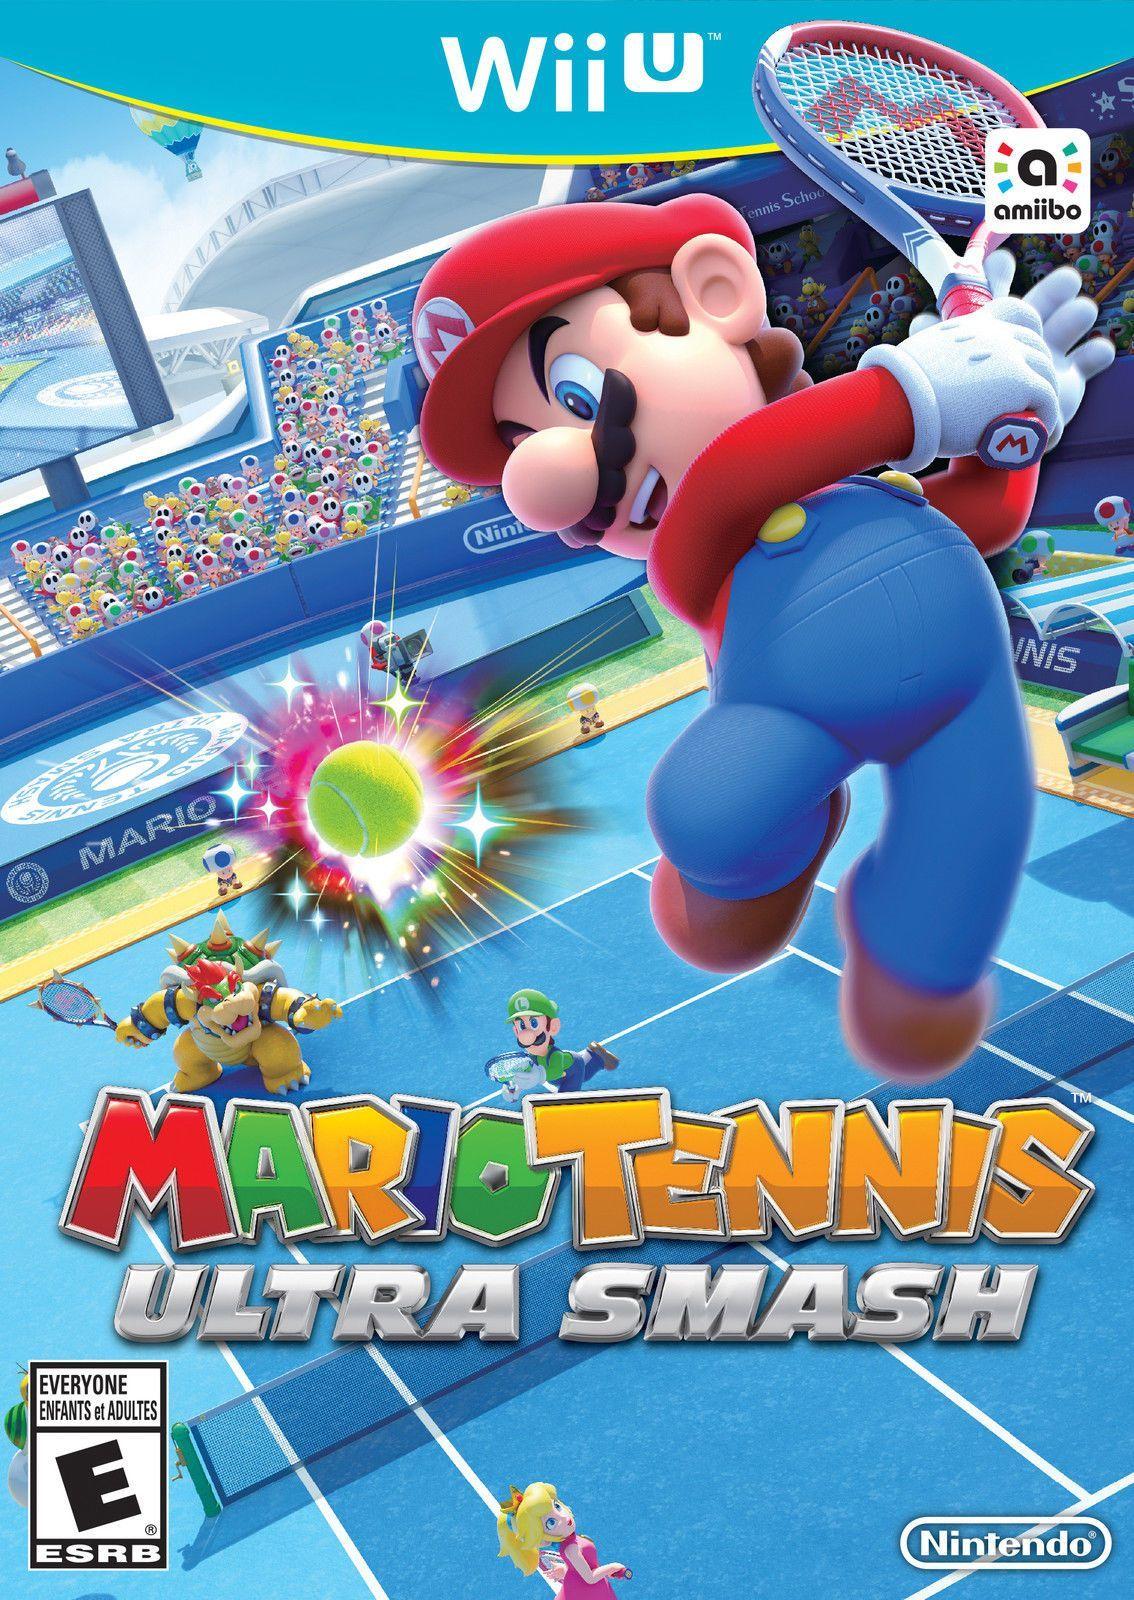 Details about Mario Tennis Ultra Smash (Wii U, 2015) Wii